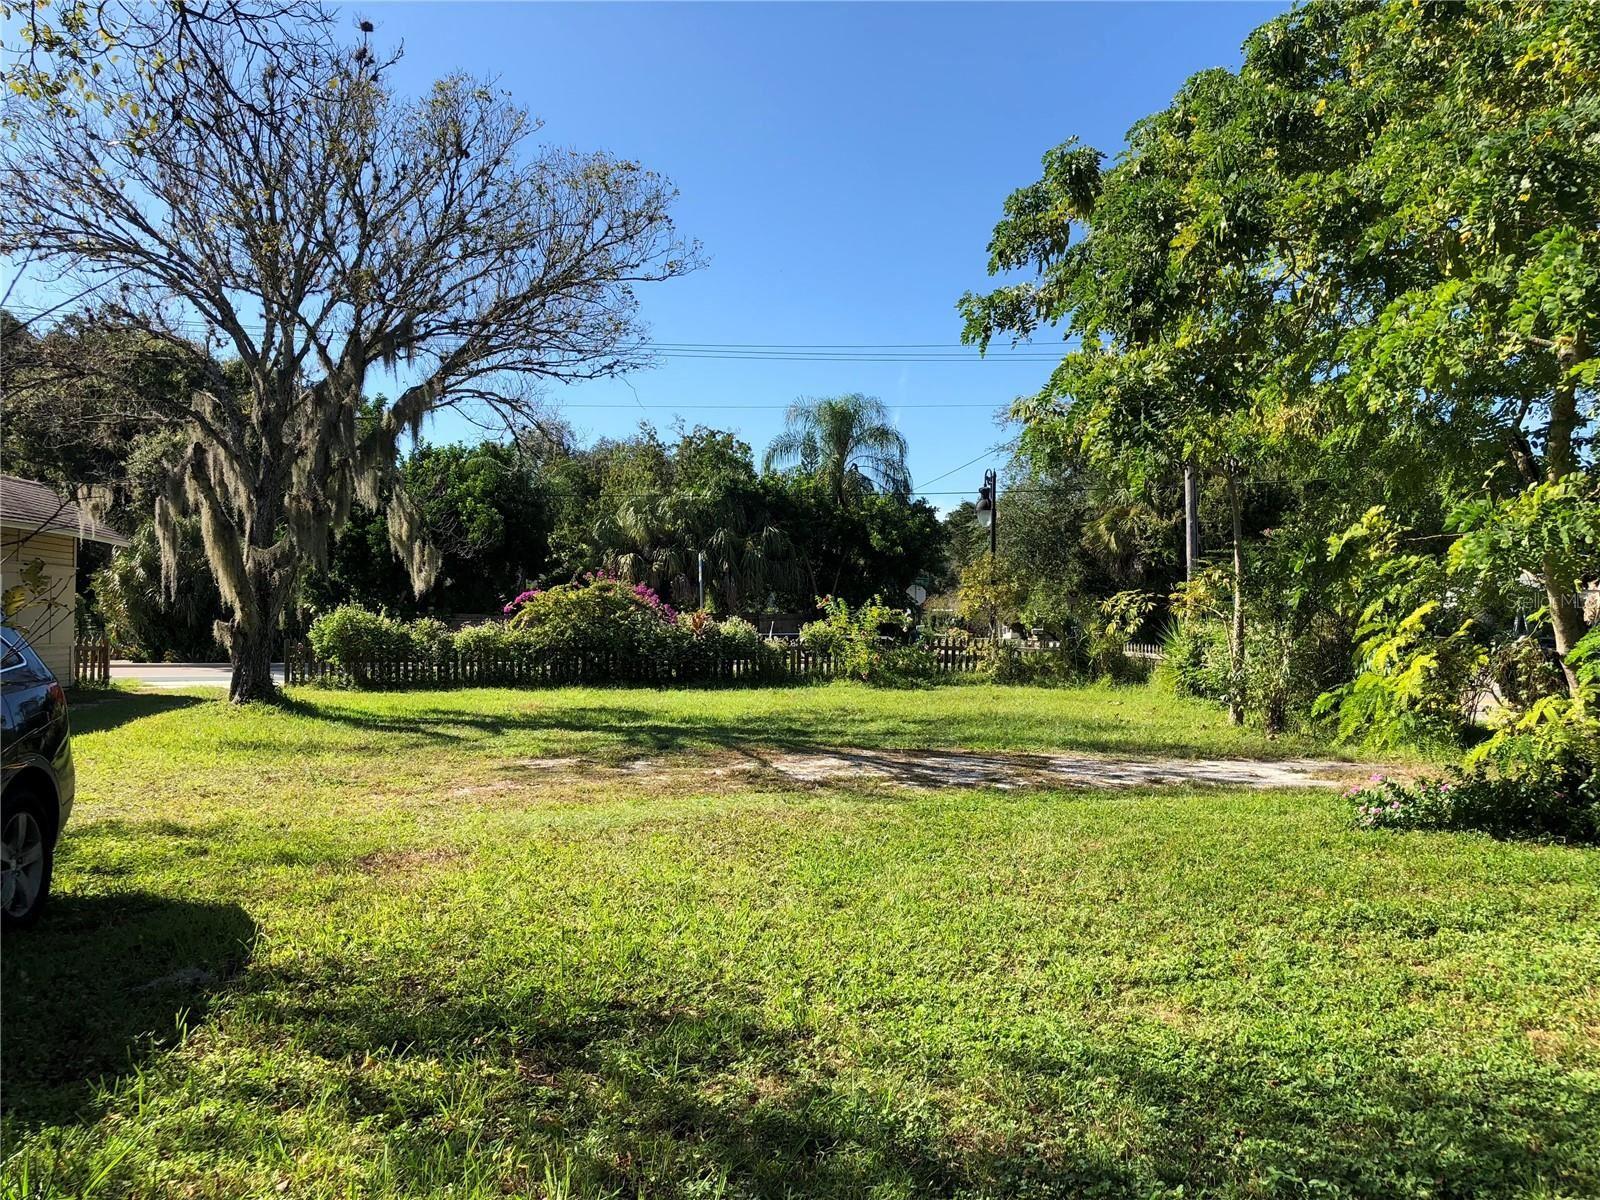 Photo of OLD BRADENTON ROAD, SARASOTA, FL 34234 (MLS # A4506171)